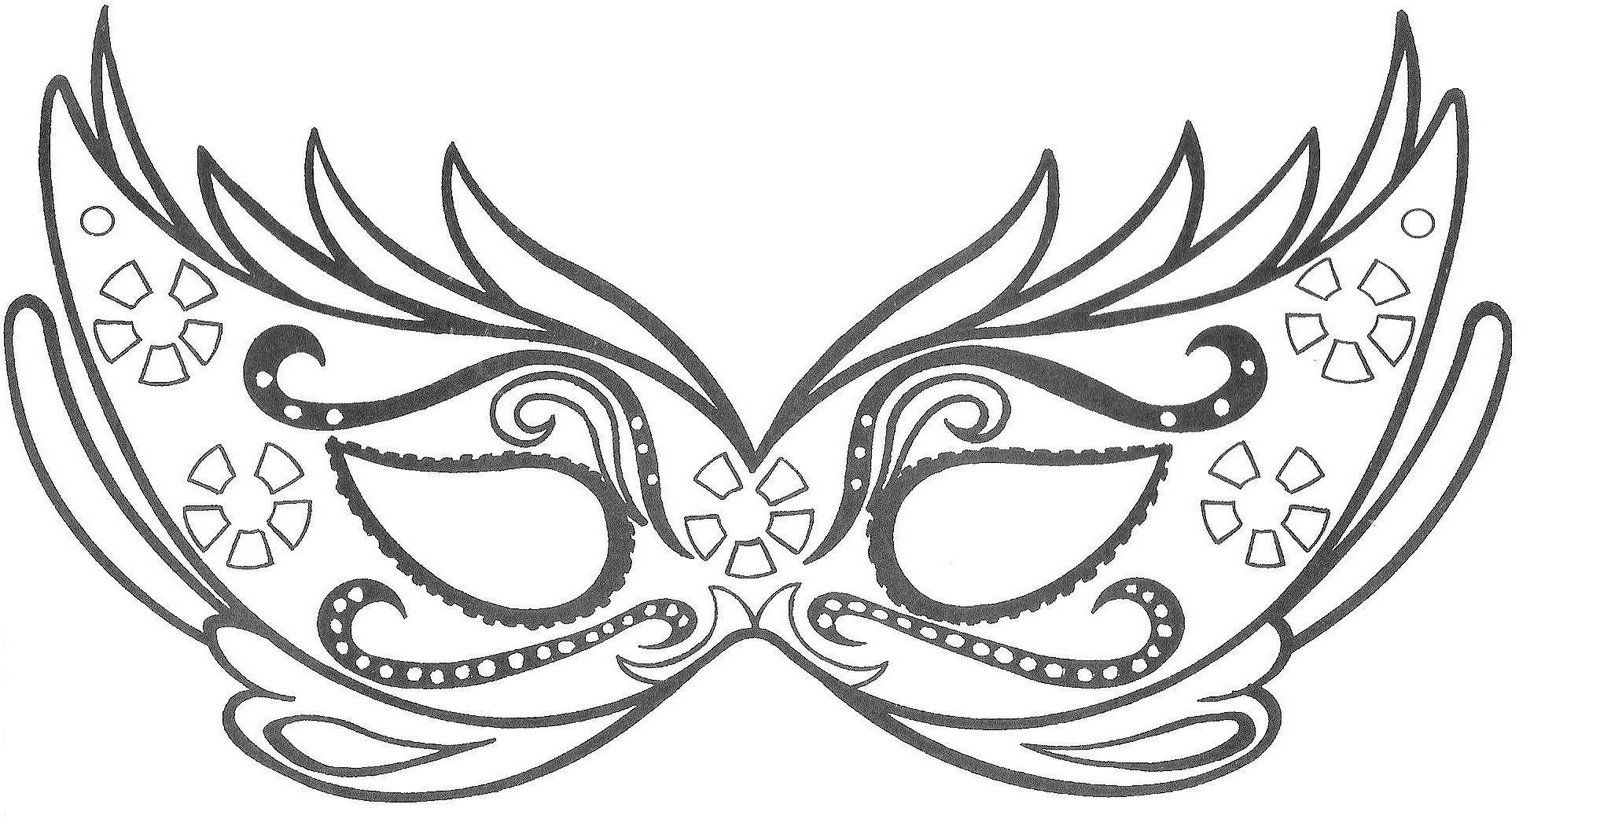 Imagens do Carnaval para imprimir e colorir   Antifaz, Carnavales y ...